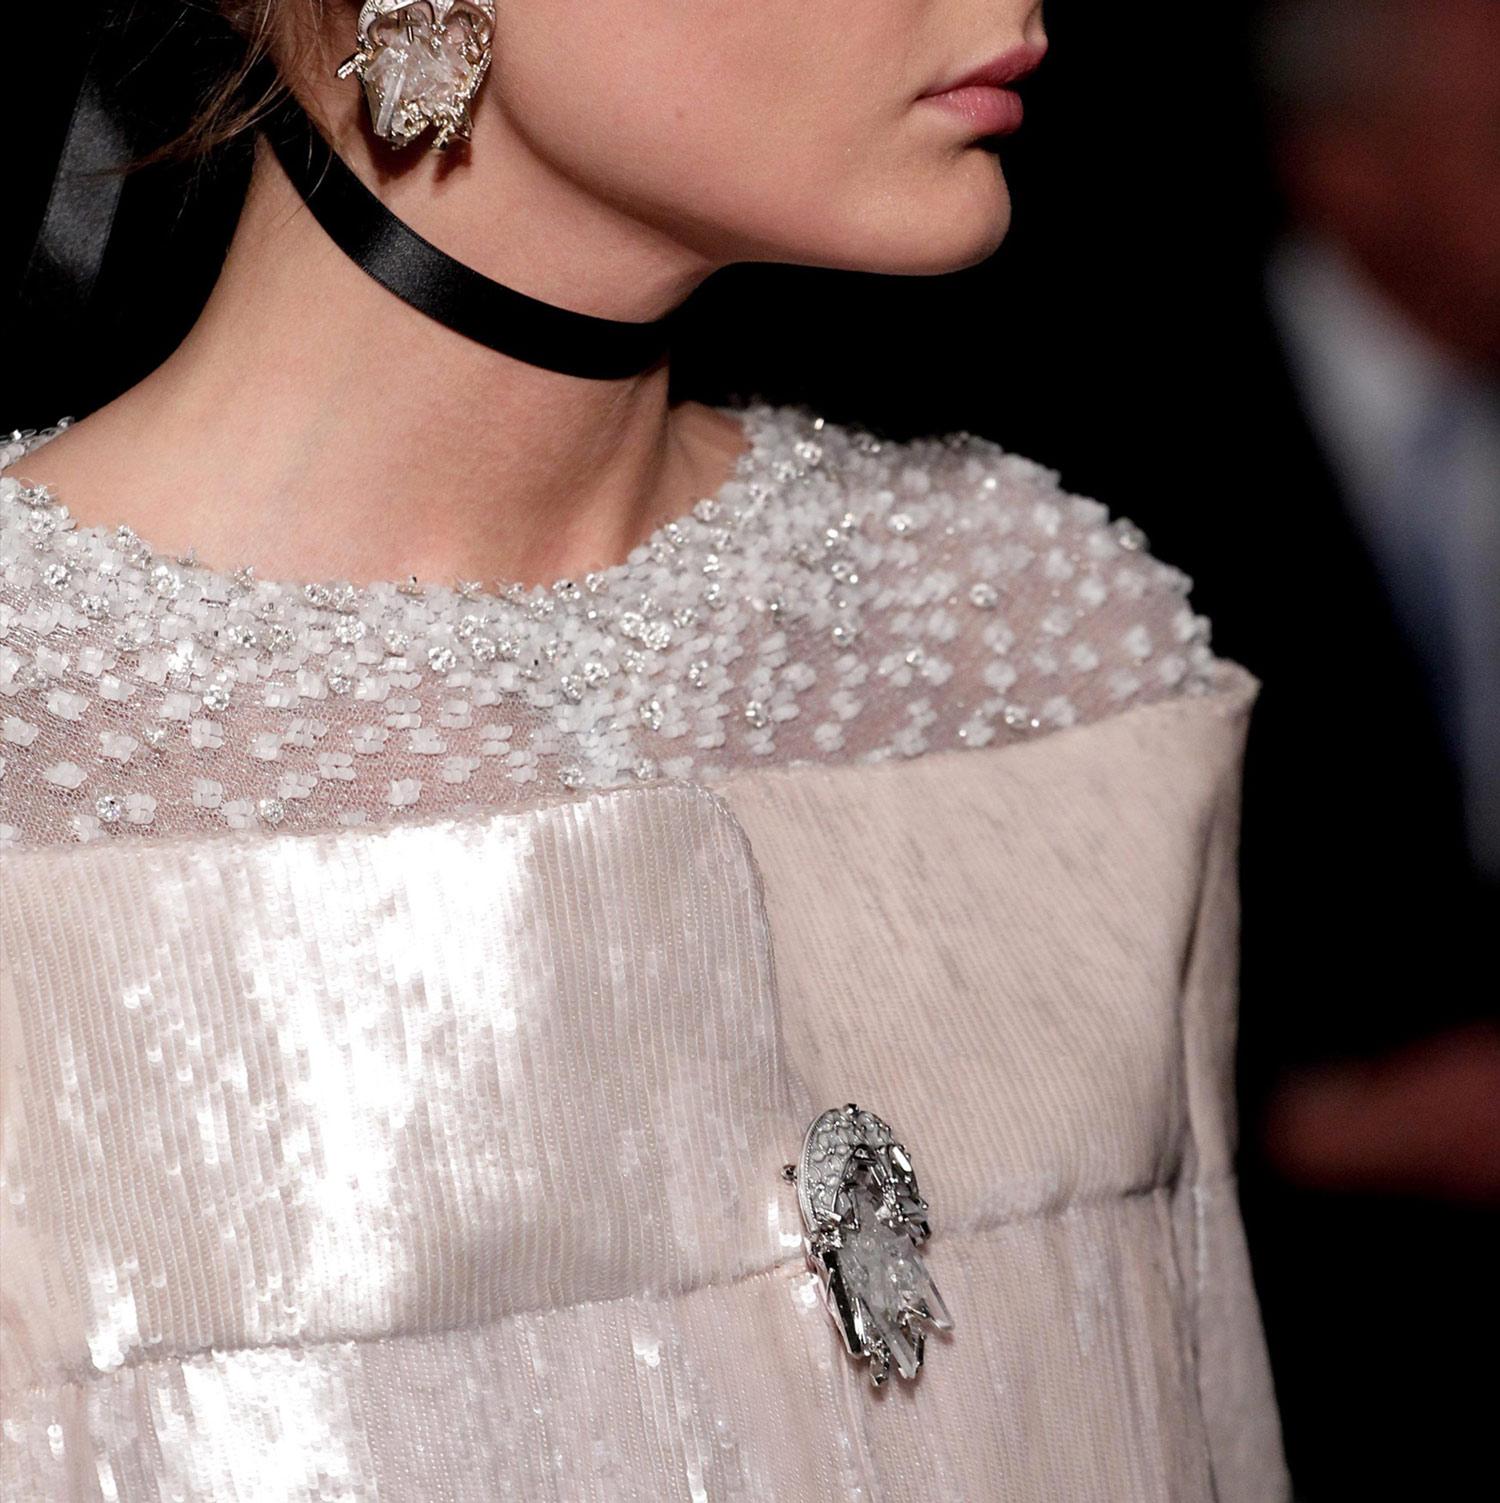 Diamonds wood chanel haute couture s s 2011 details part ii for Haute couture details